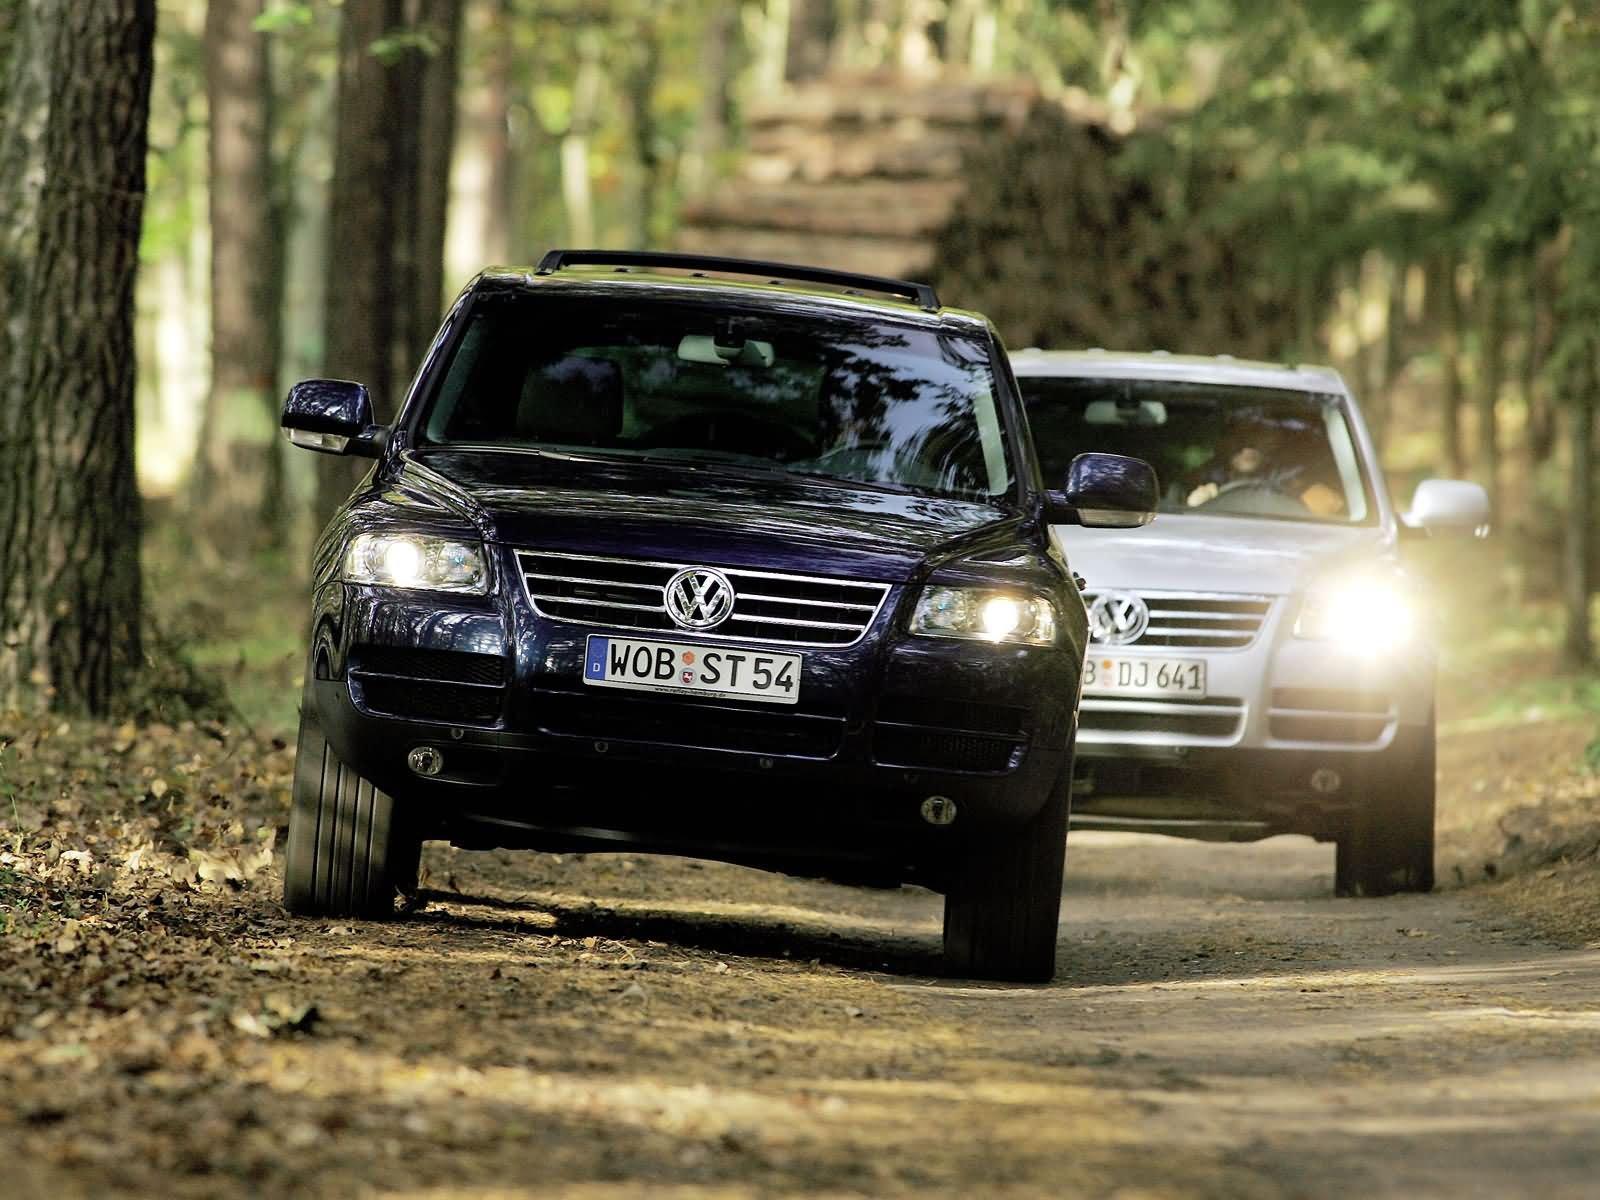 2011 vw touareg hybrid wants to be like porshe, starts at $60,565